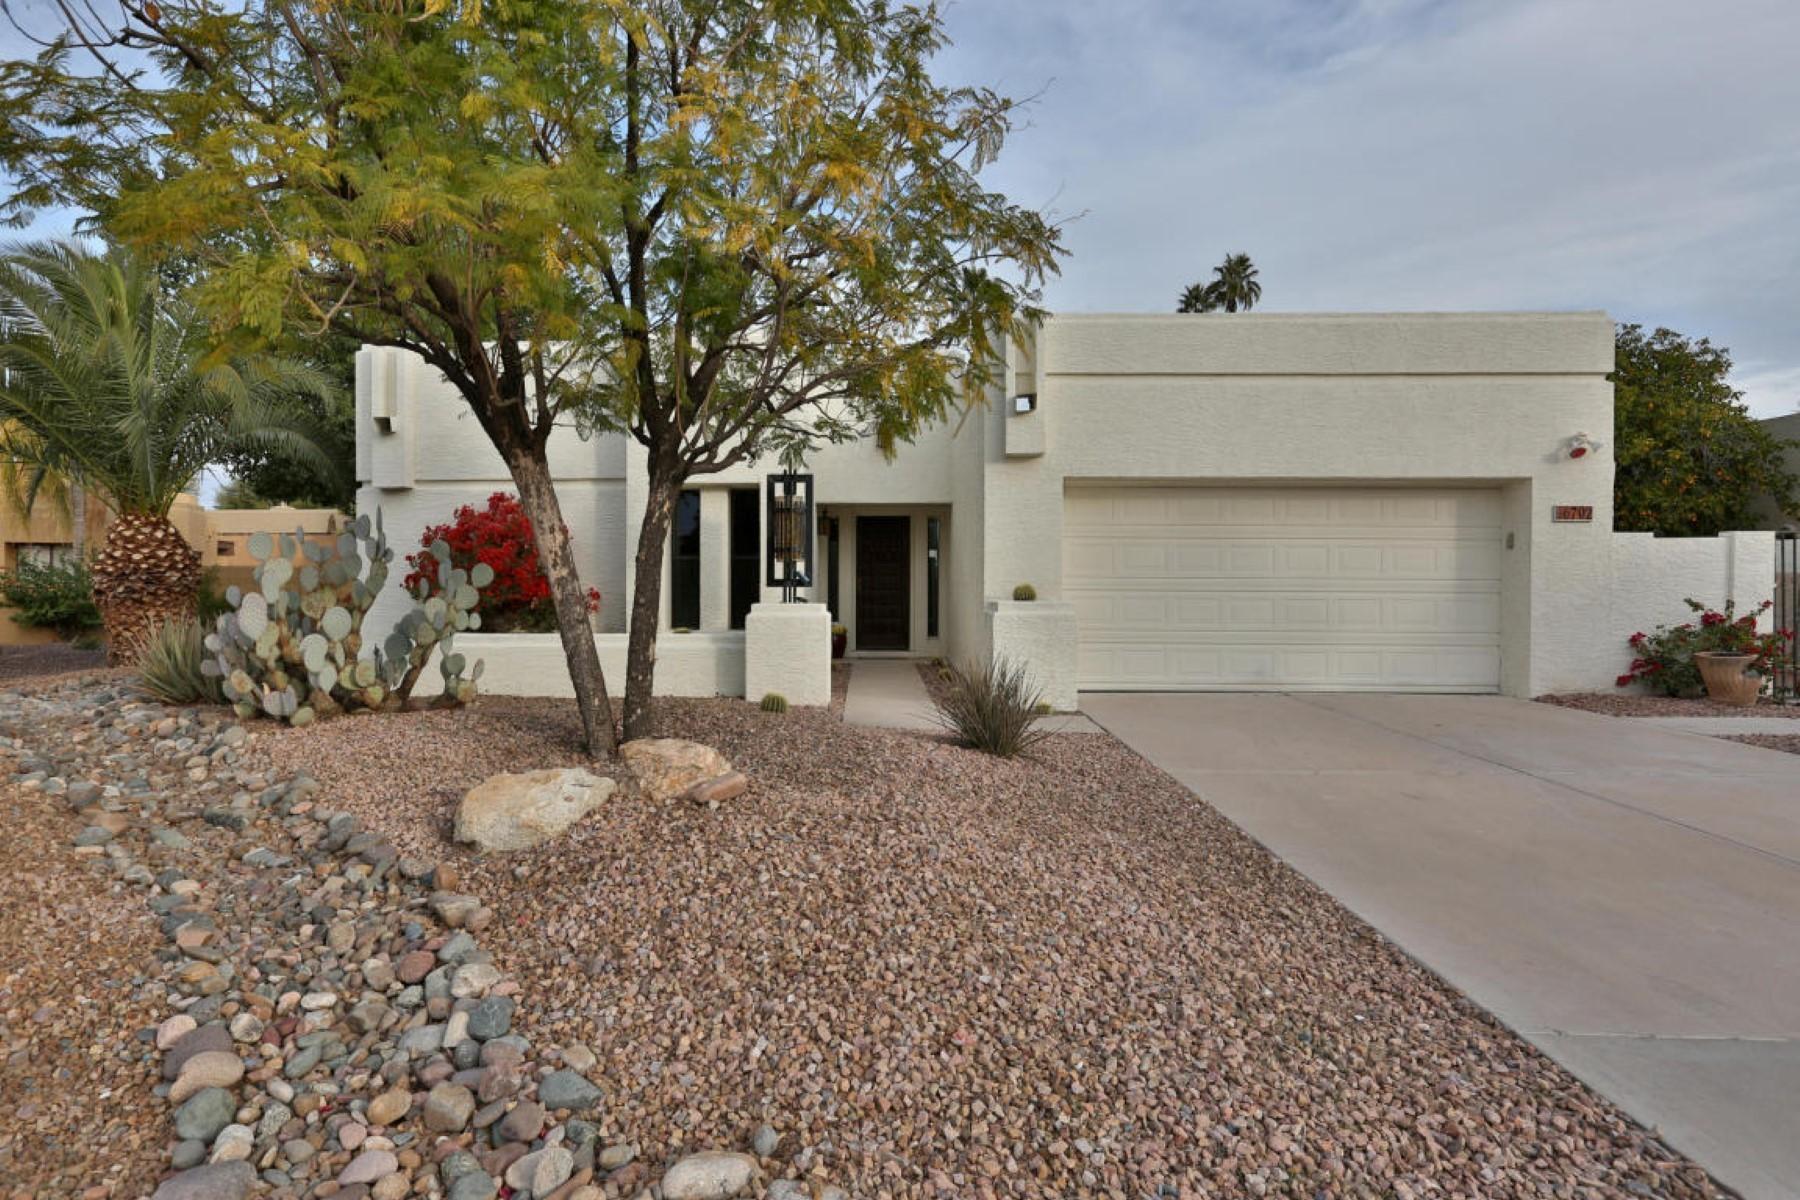 Villa per Vendita alle ore Stunning newly remodeled home 6702 E Phelps Rd Scottsdale, Arizona 85254 Stati Uniti